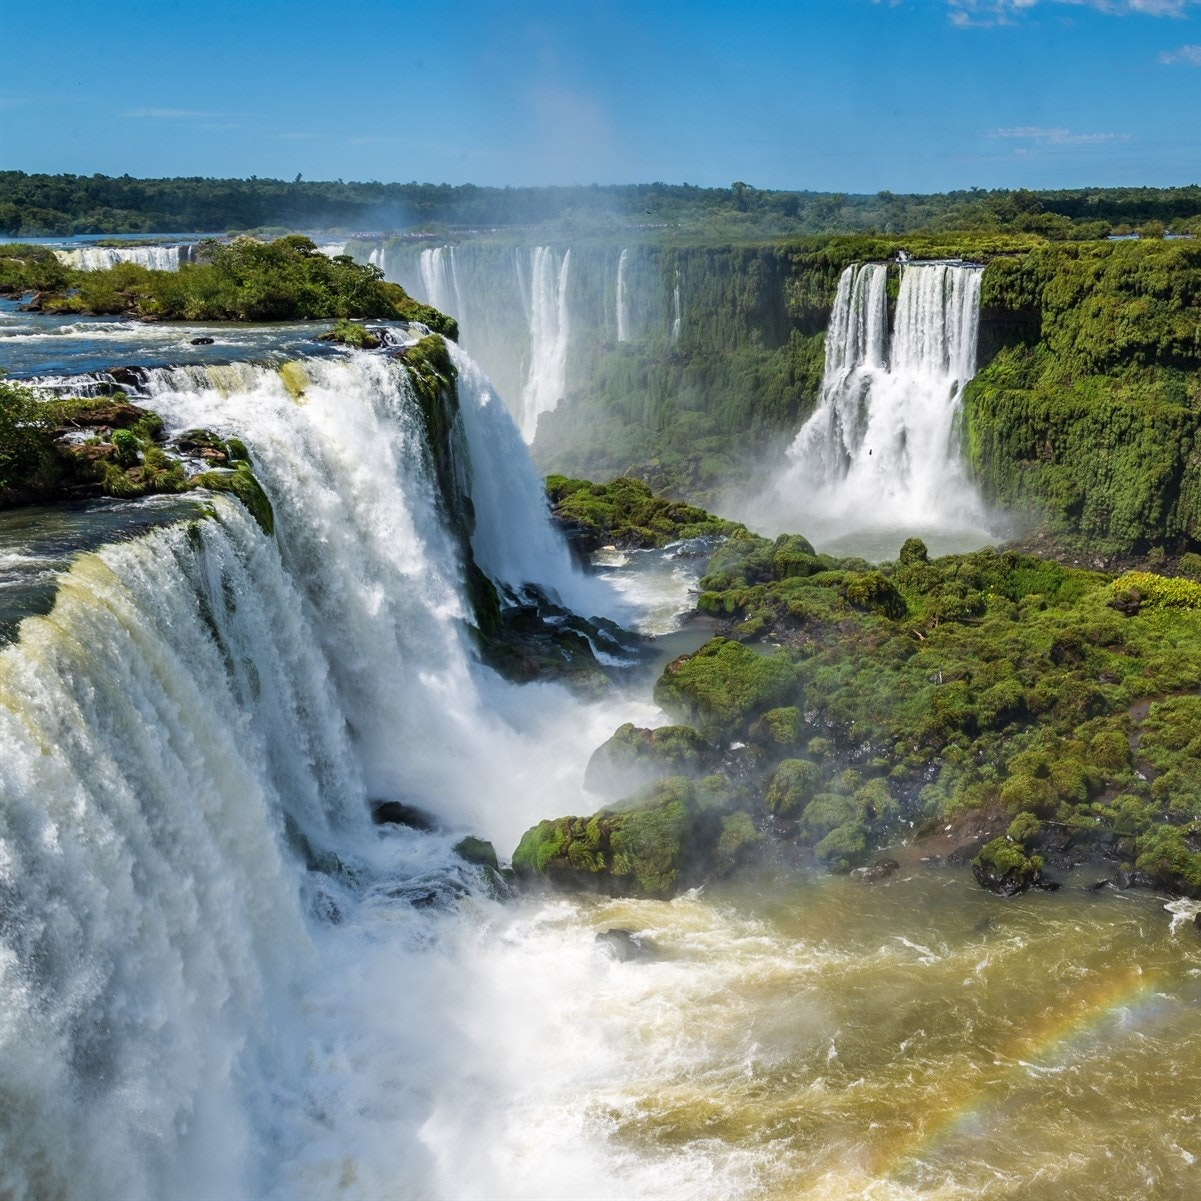 Fit For Travel Brazil: Peru & Brazil Made Easy, South America